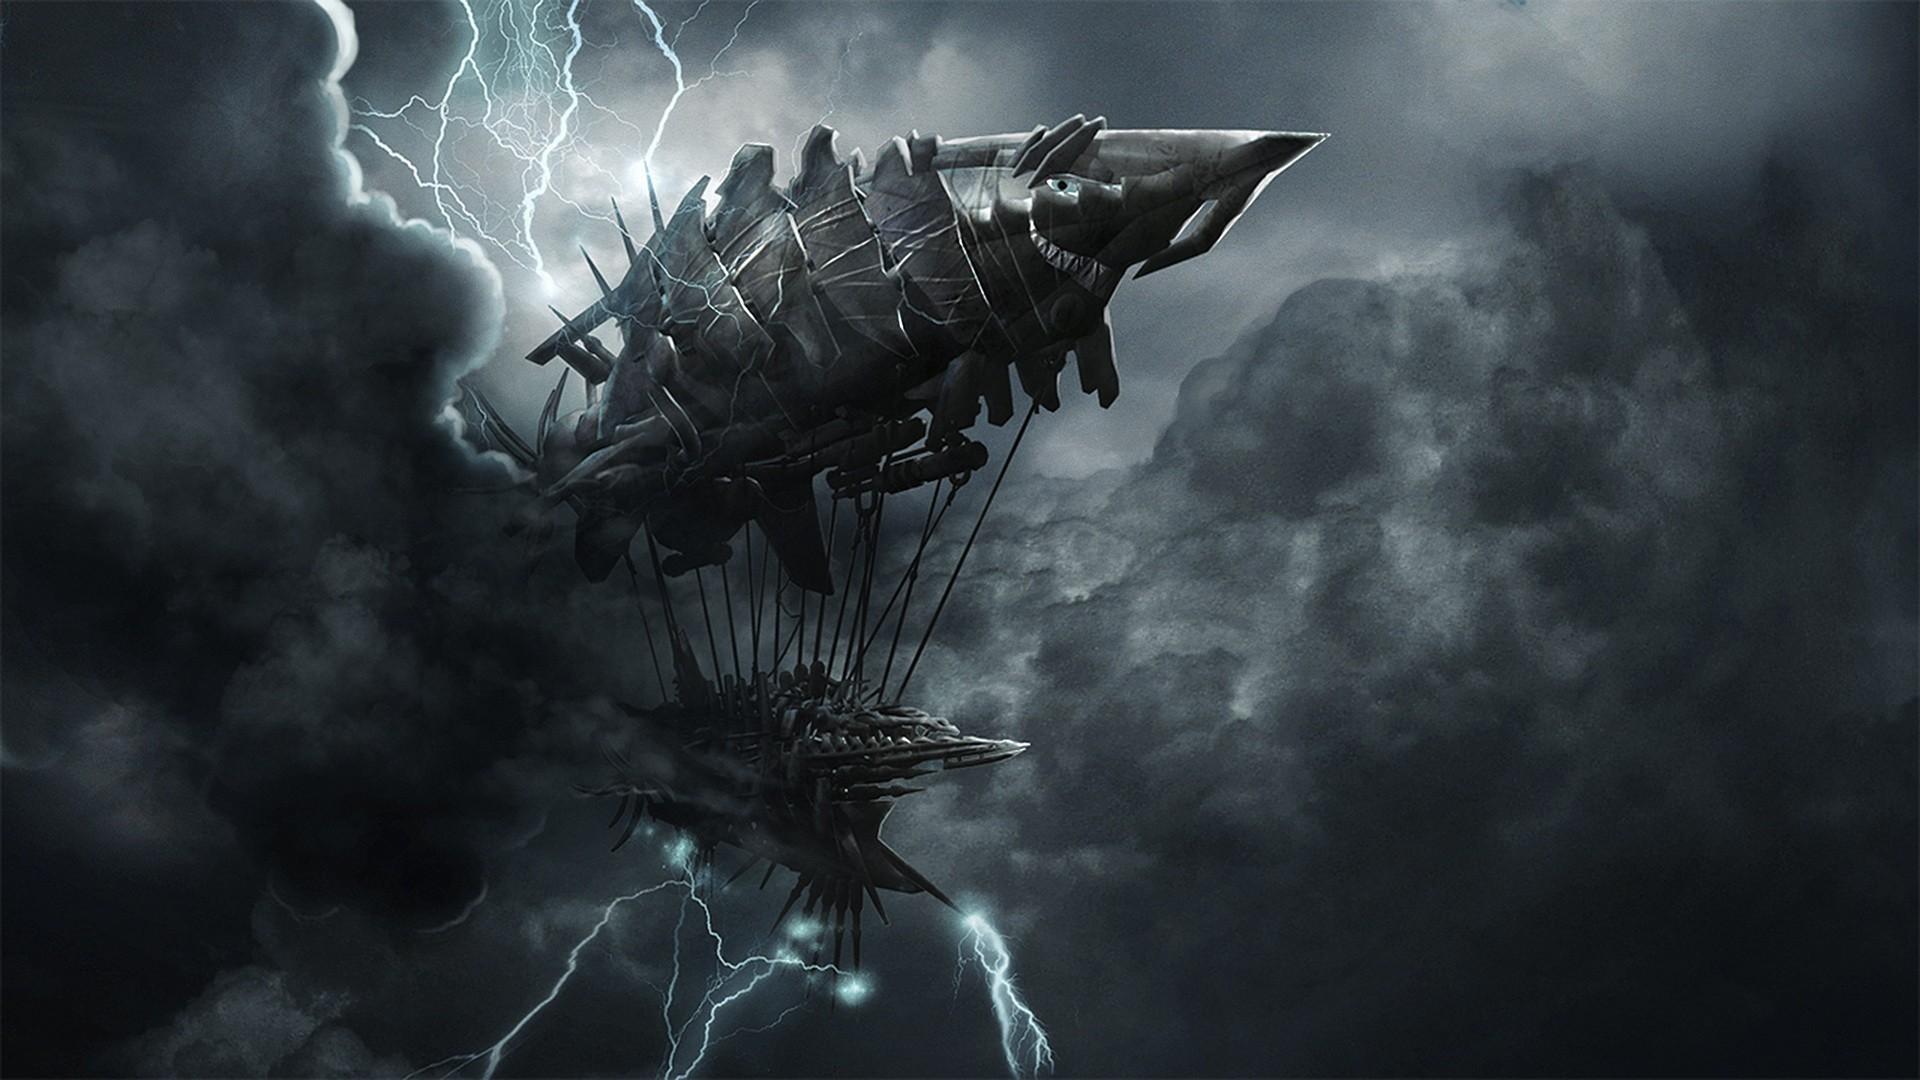 Res: 1920x1080, Video Game - Dark Storm Wallpaper